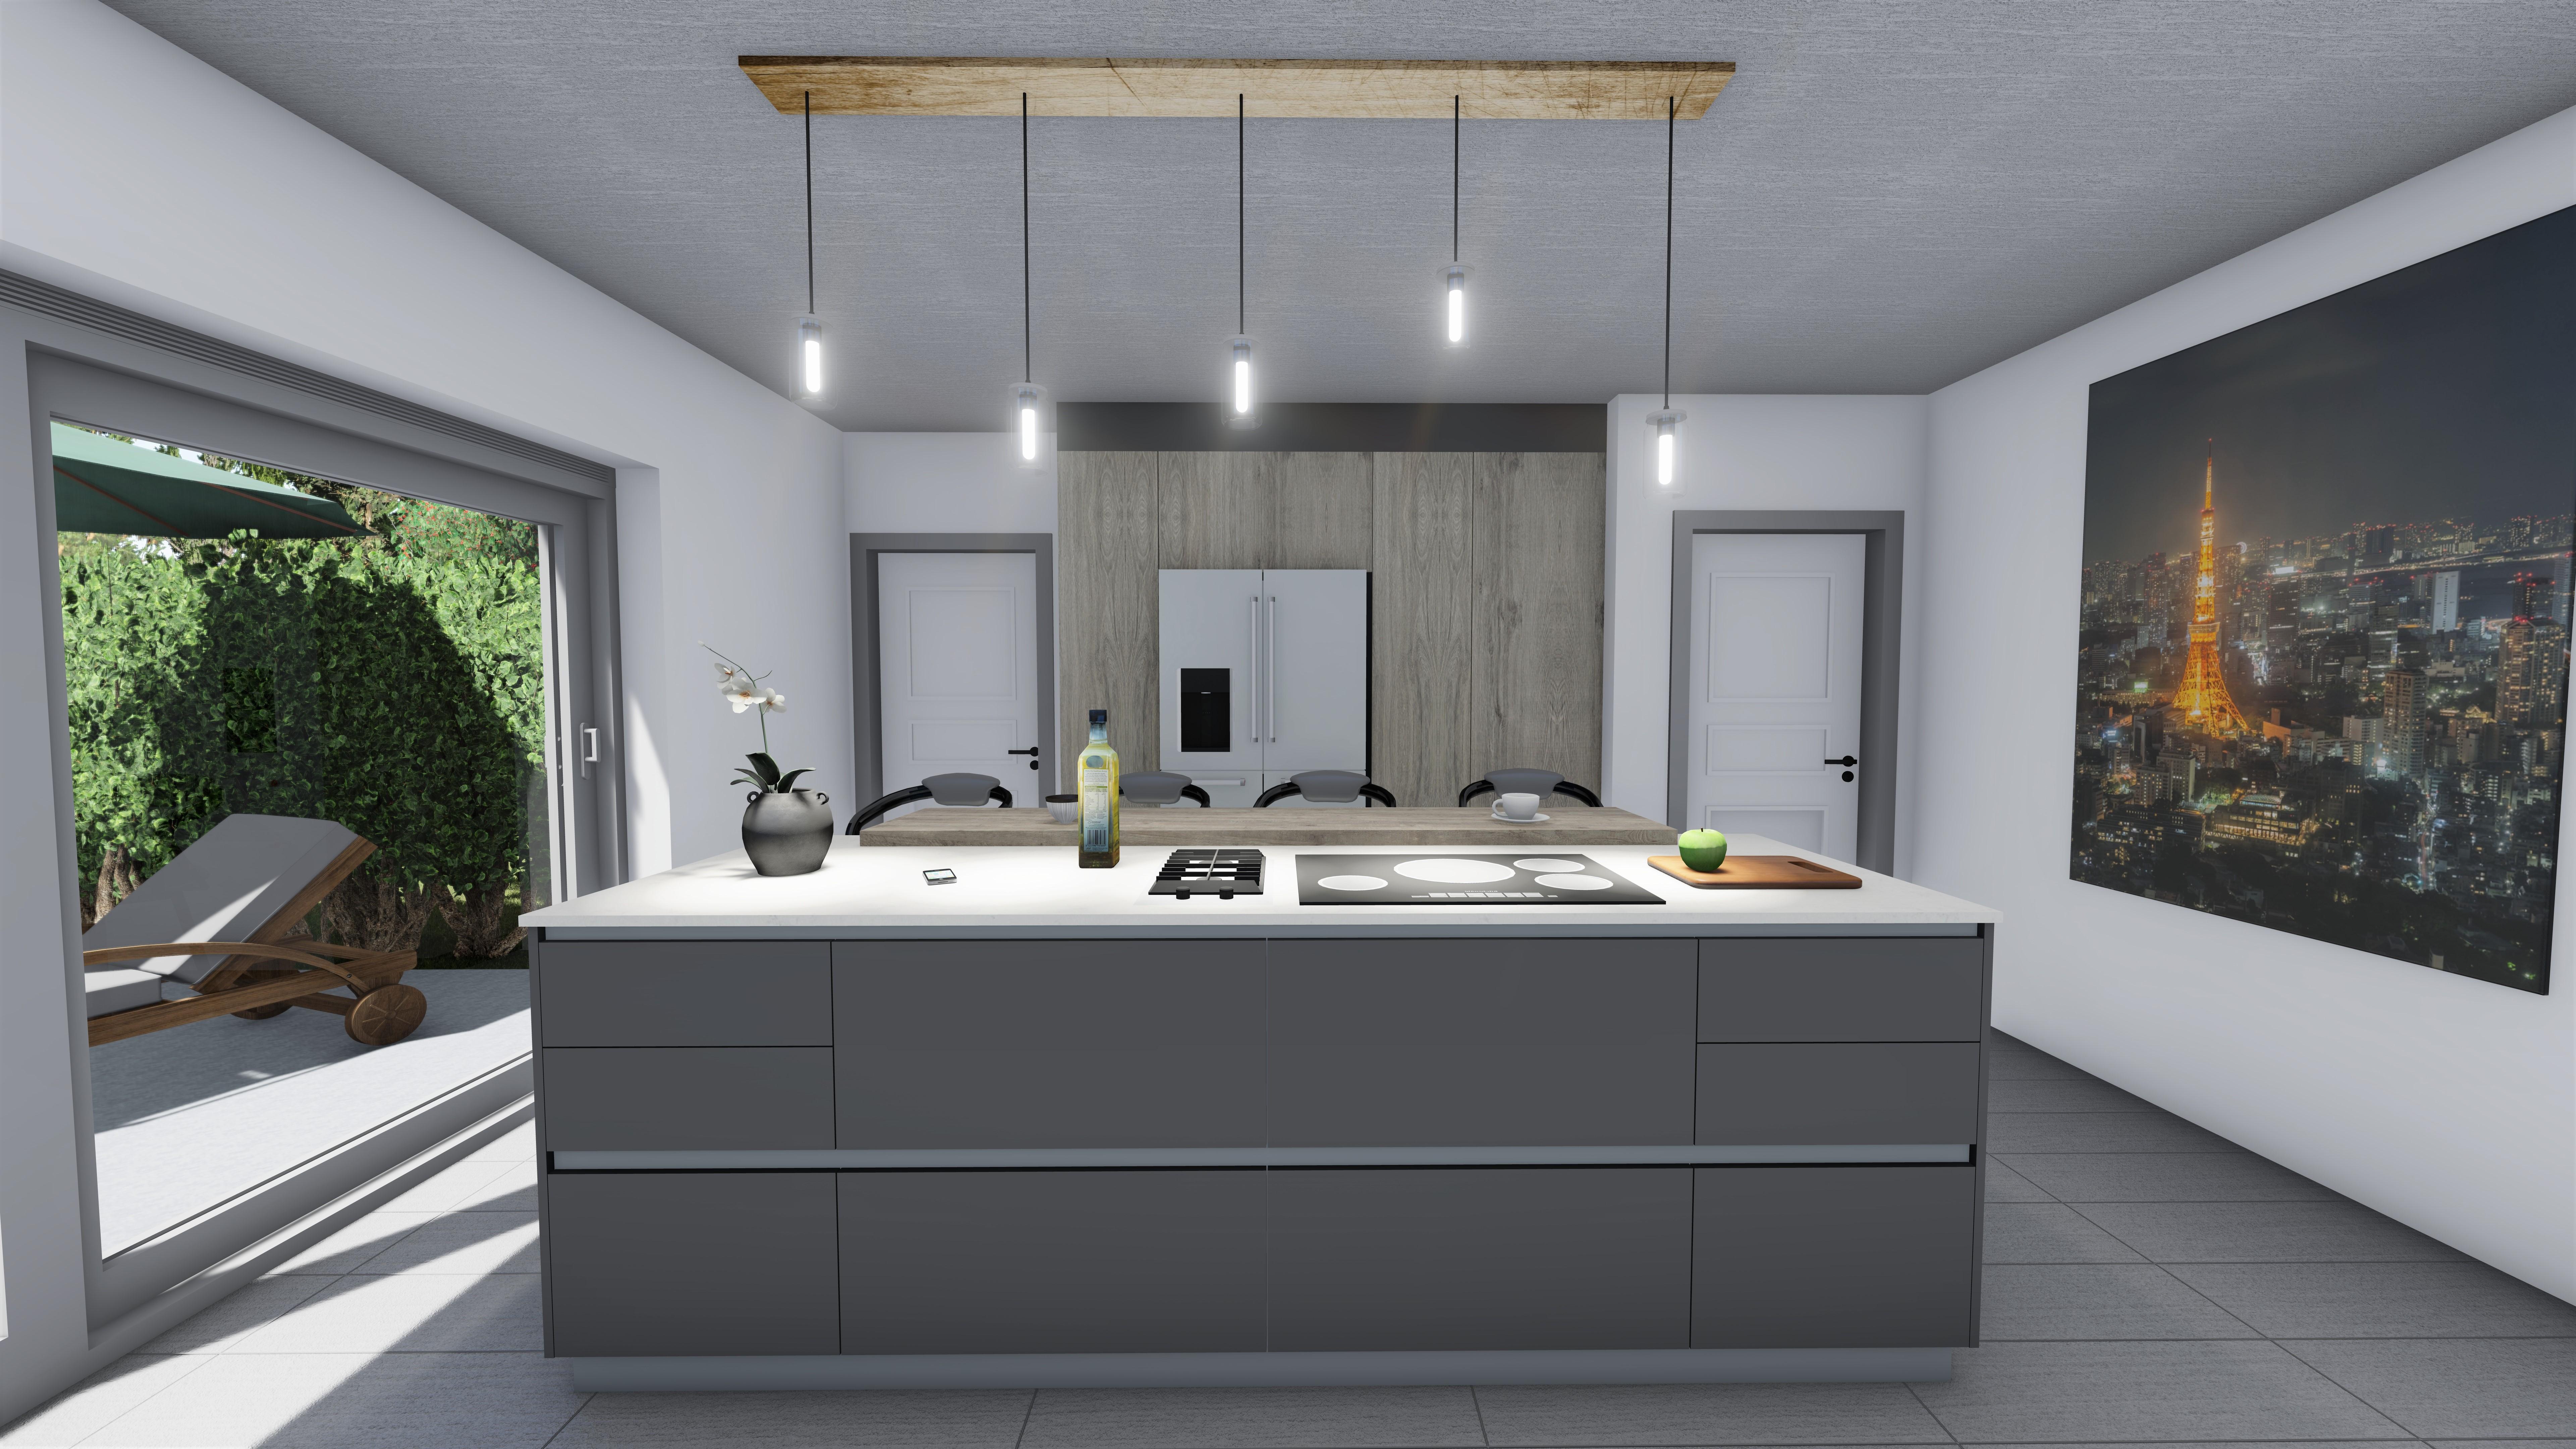 keuken_15 - Foto